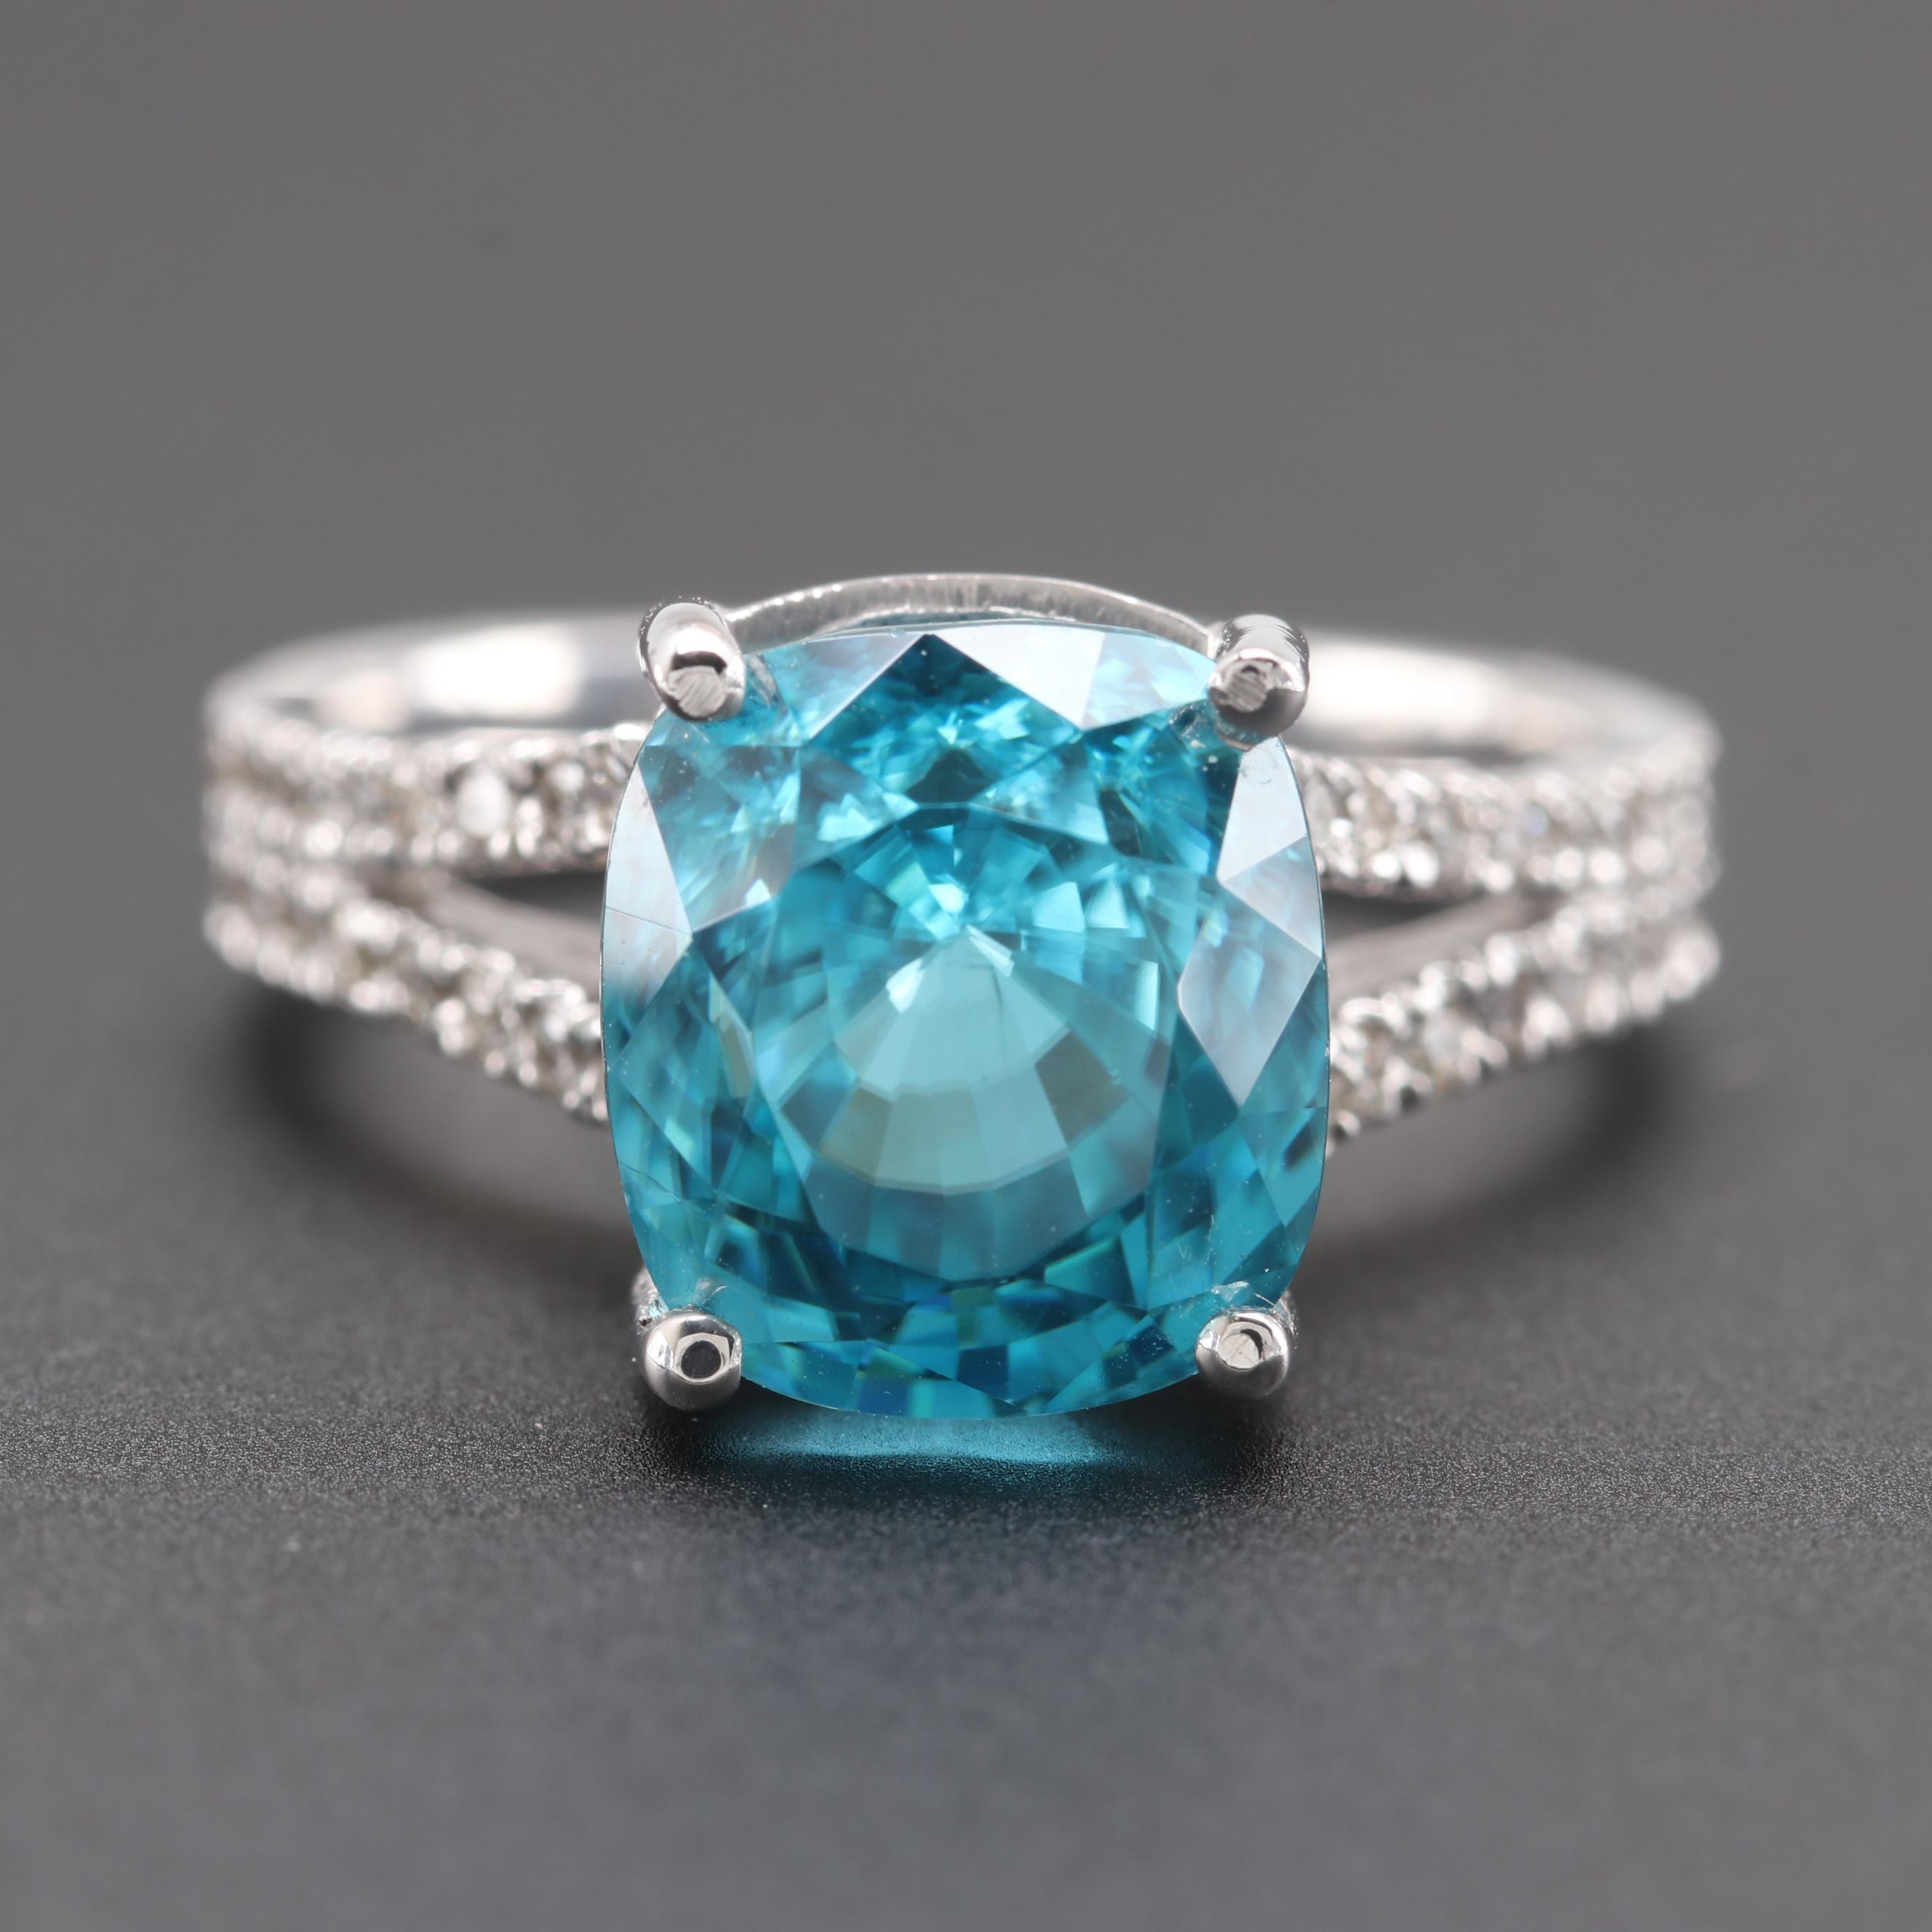 14K White Gold 7.18 CT Blue Zircon and Diamond Ring